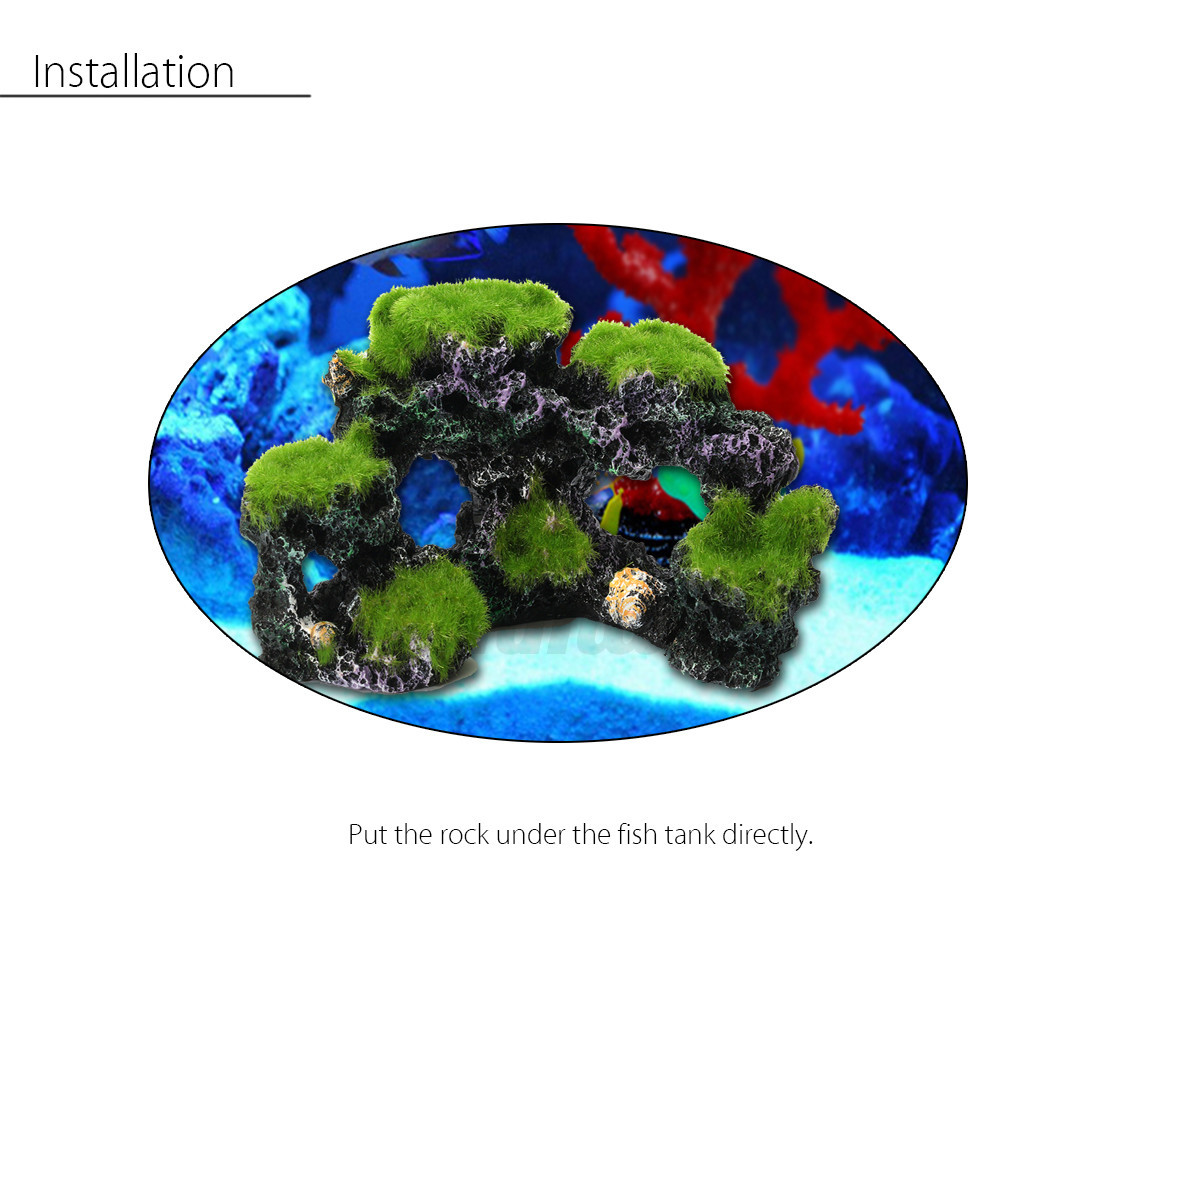 New aquarium mountain rockery coral reef rock cave moss for Aquarium mountain decoration